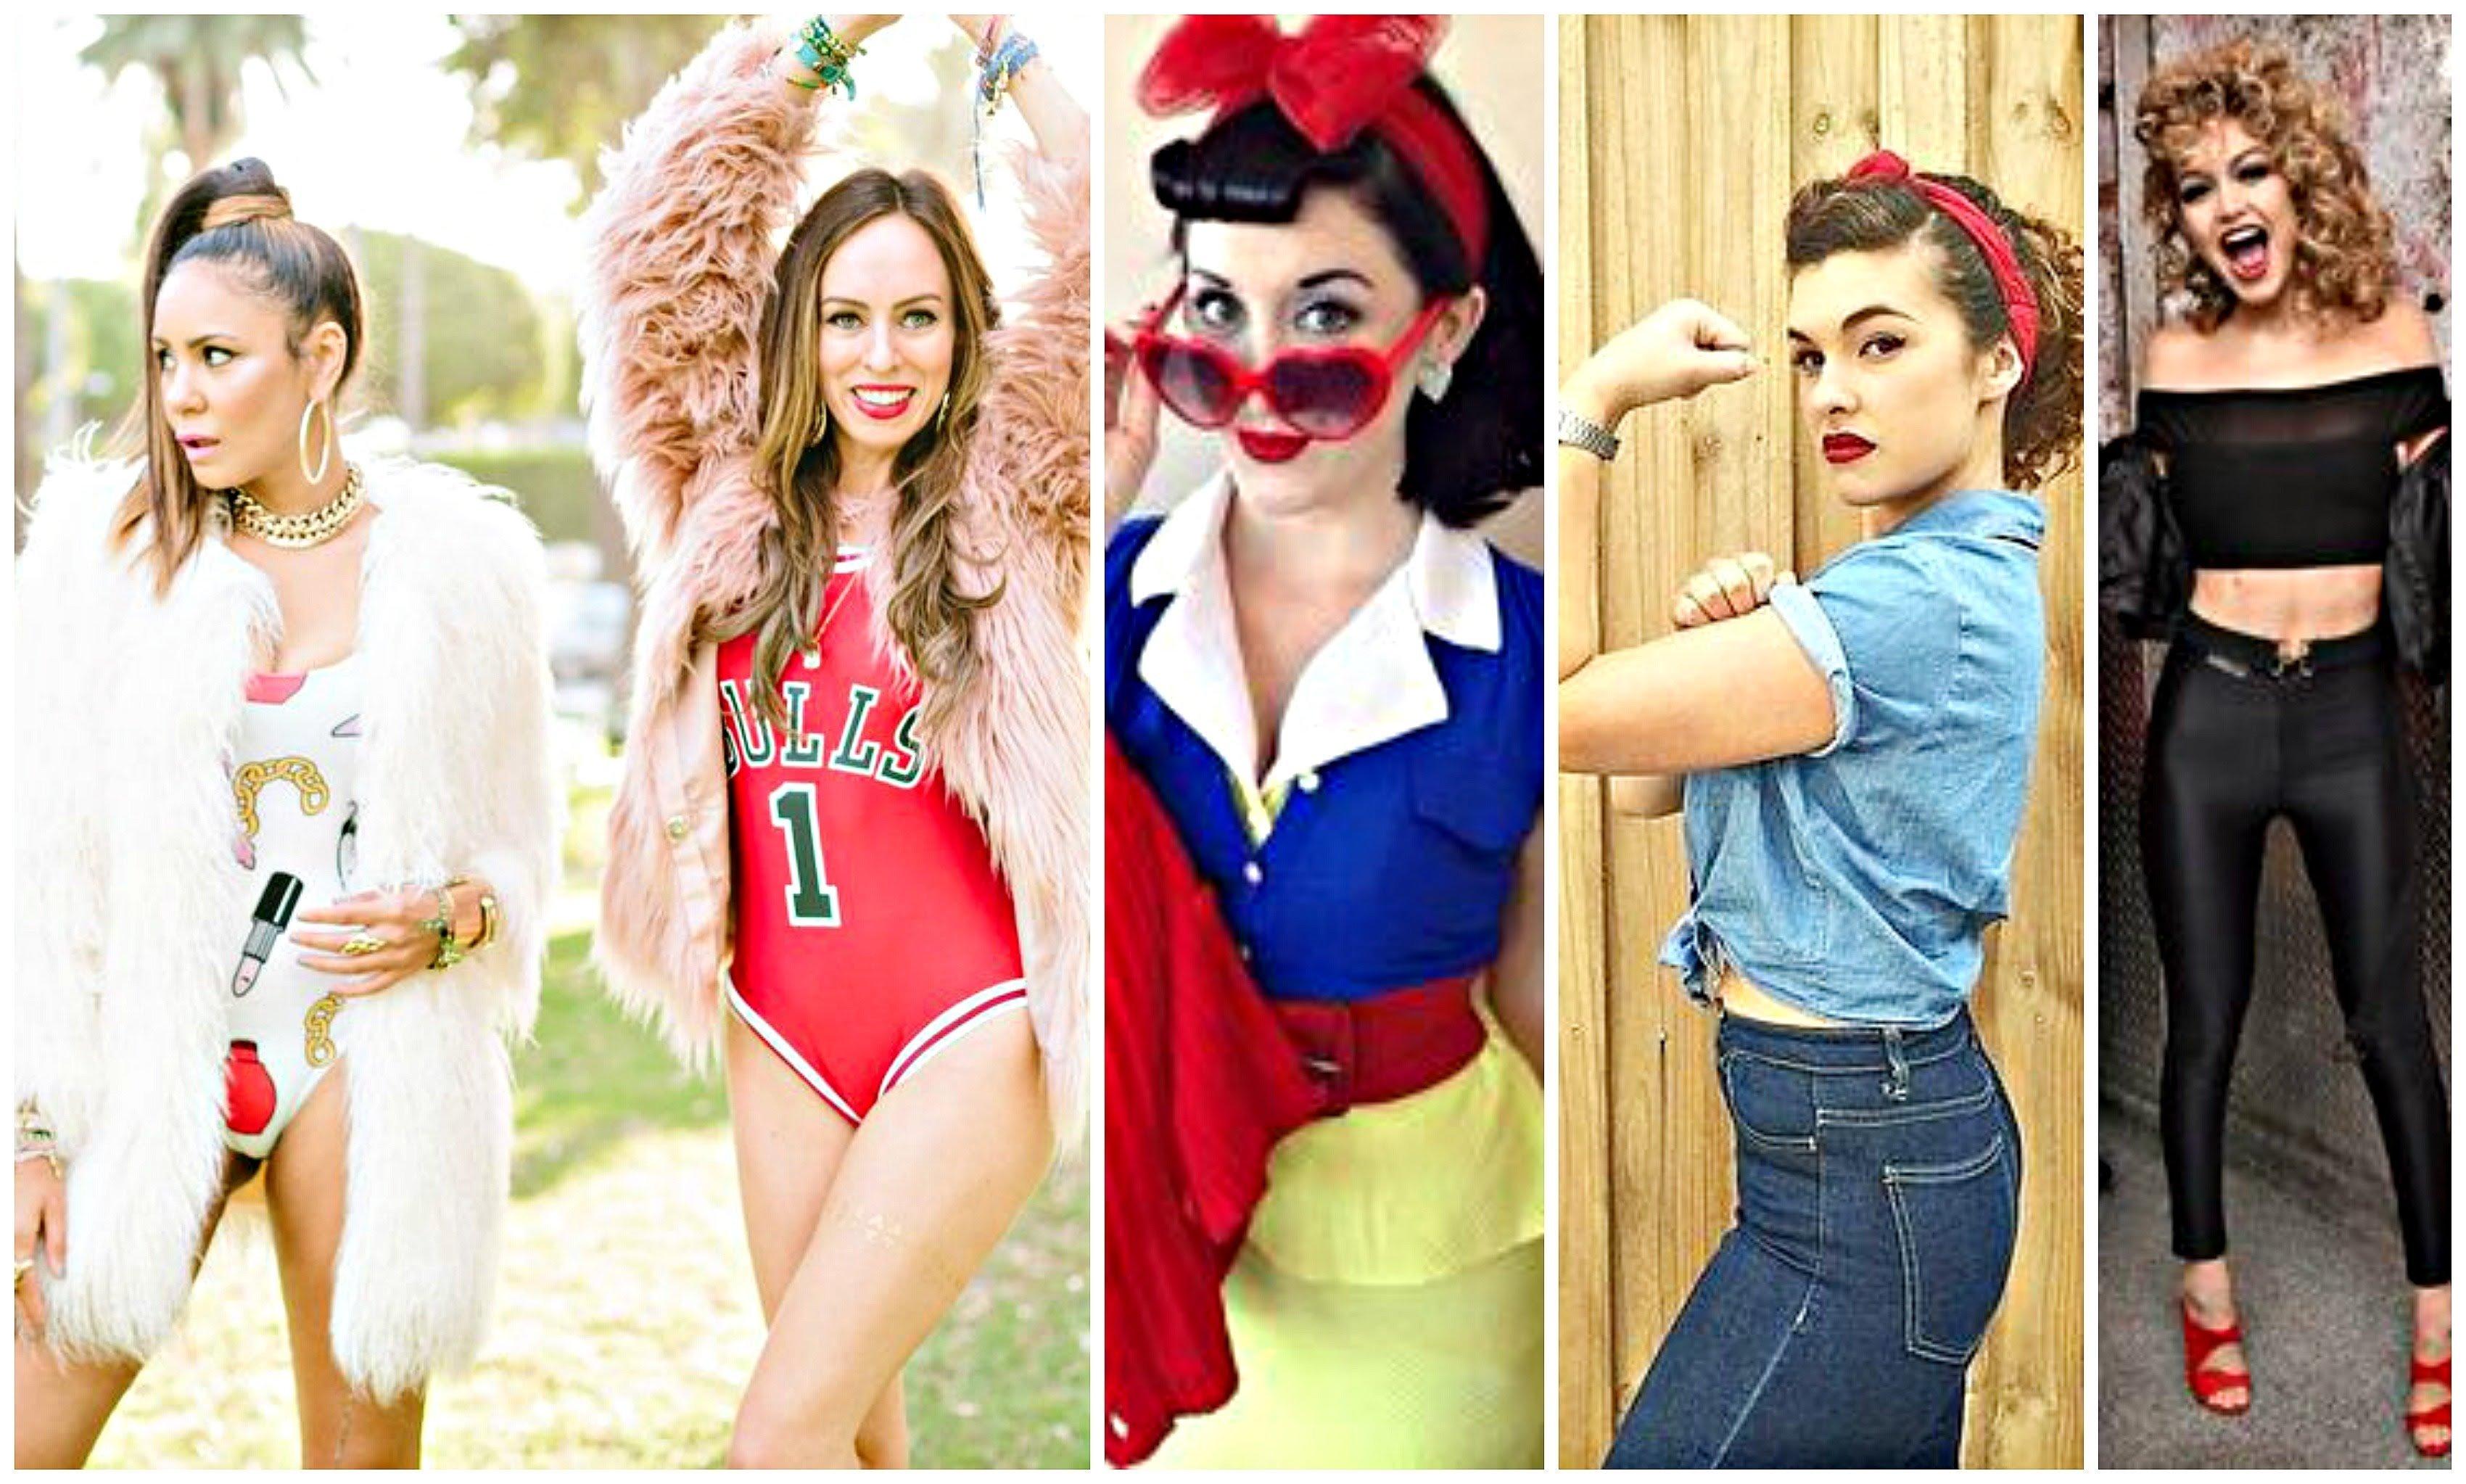 10 Fantastic Simple Costume Ideas For Women top halloween costume ideas for women youtube 9 2020